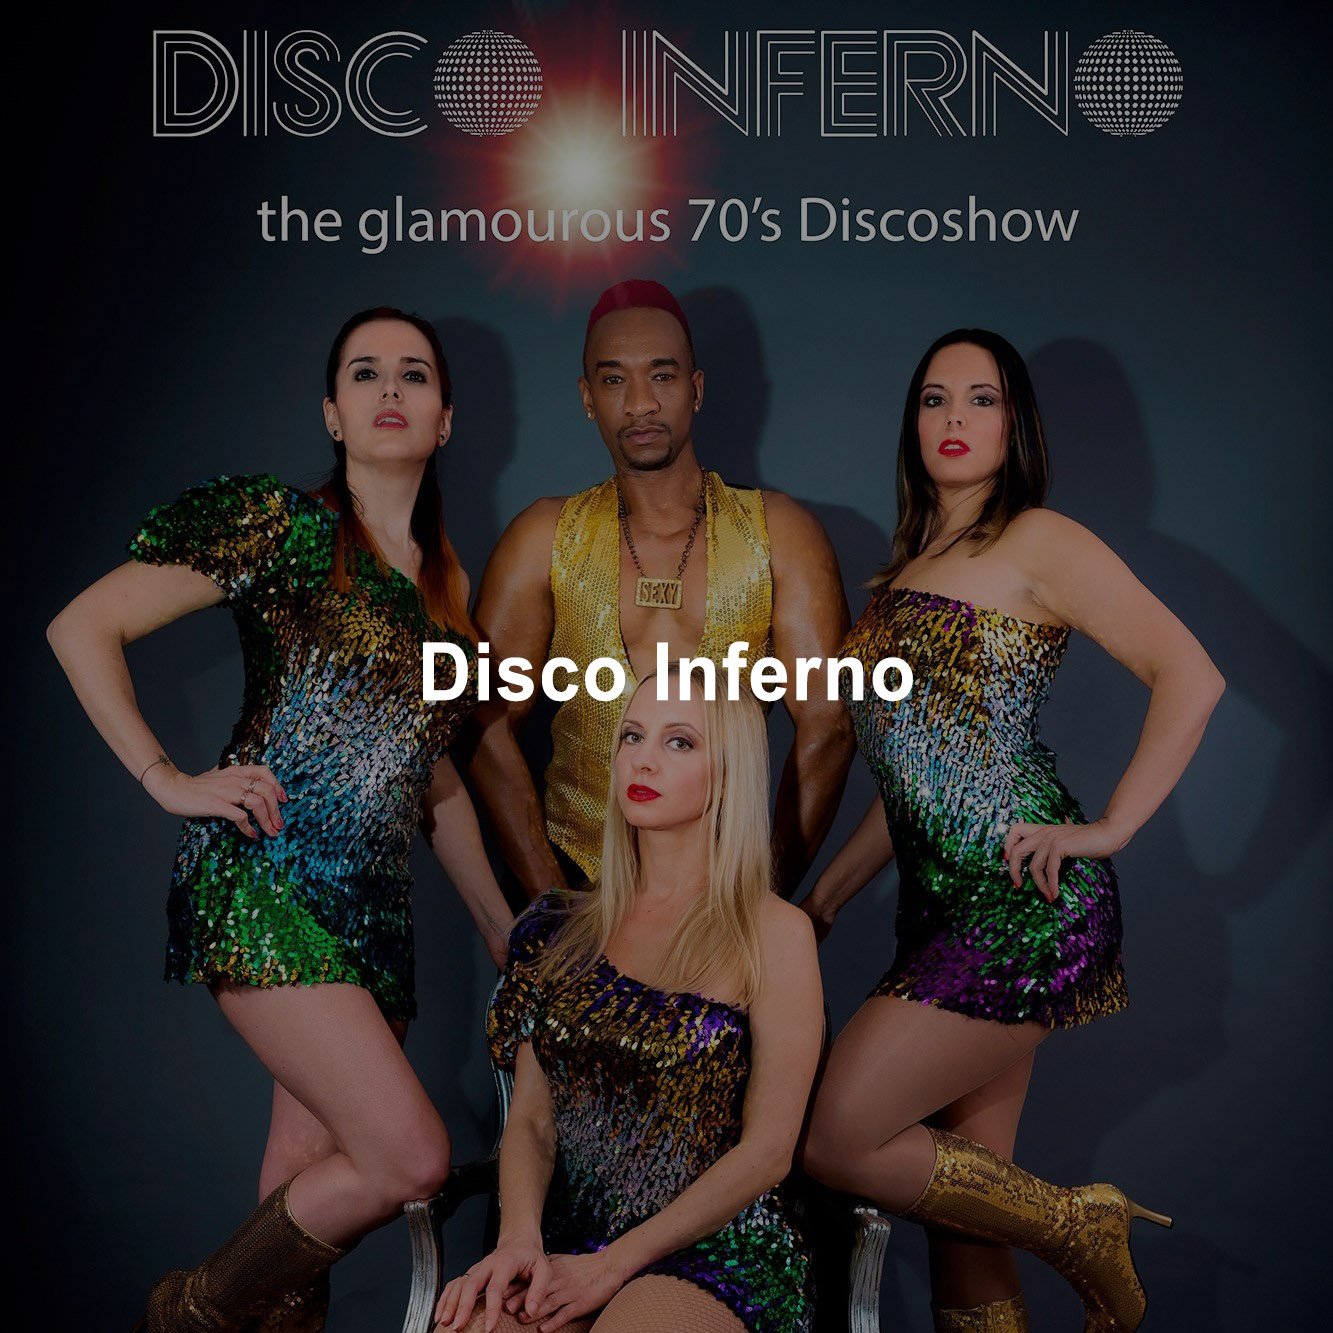 Disco Inferno the glamourous 70´s Discoshow